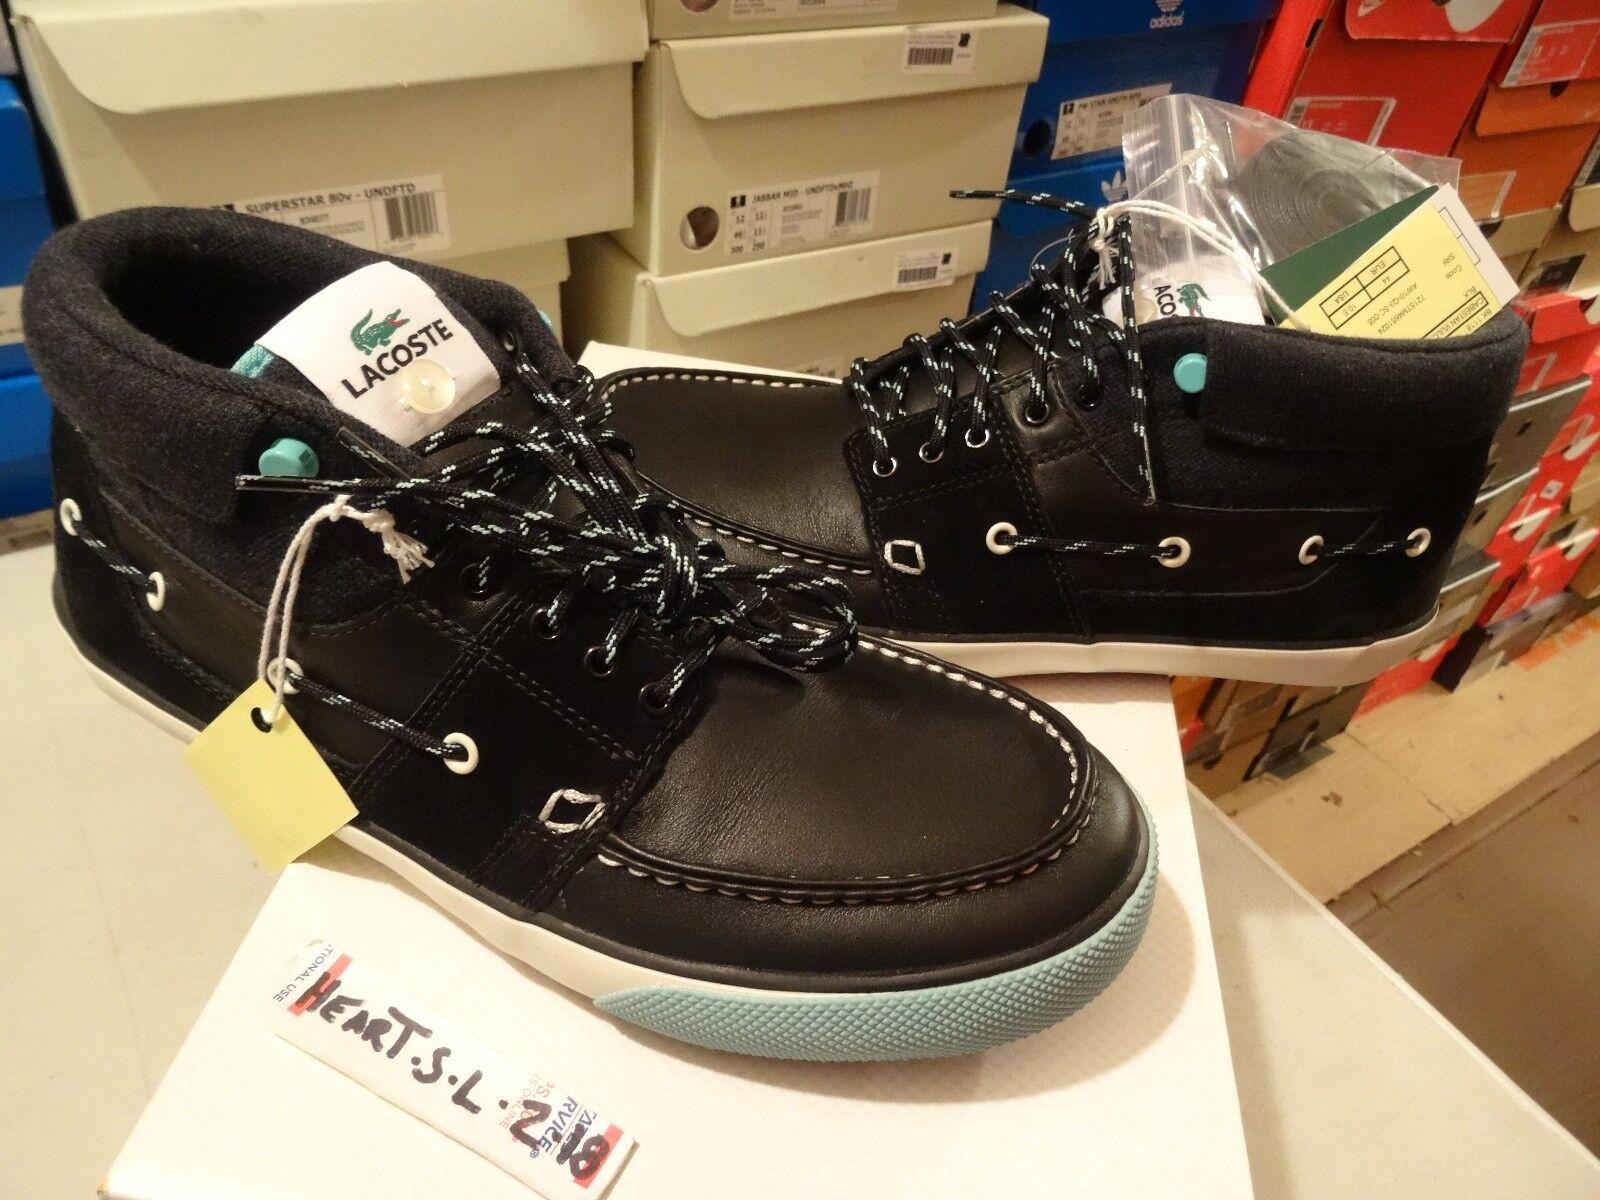 NEW LACOSTE LEGENDS CABESTAN VULC MID LSF2 STM scarpe da ginnastica FREAKER BLK blu SZ 10.5